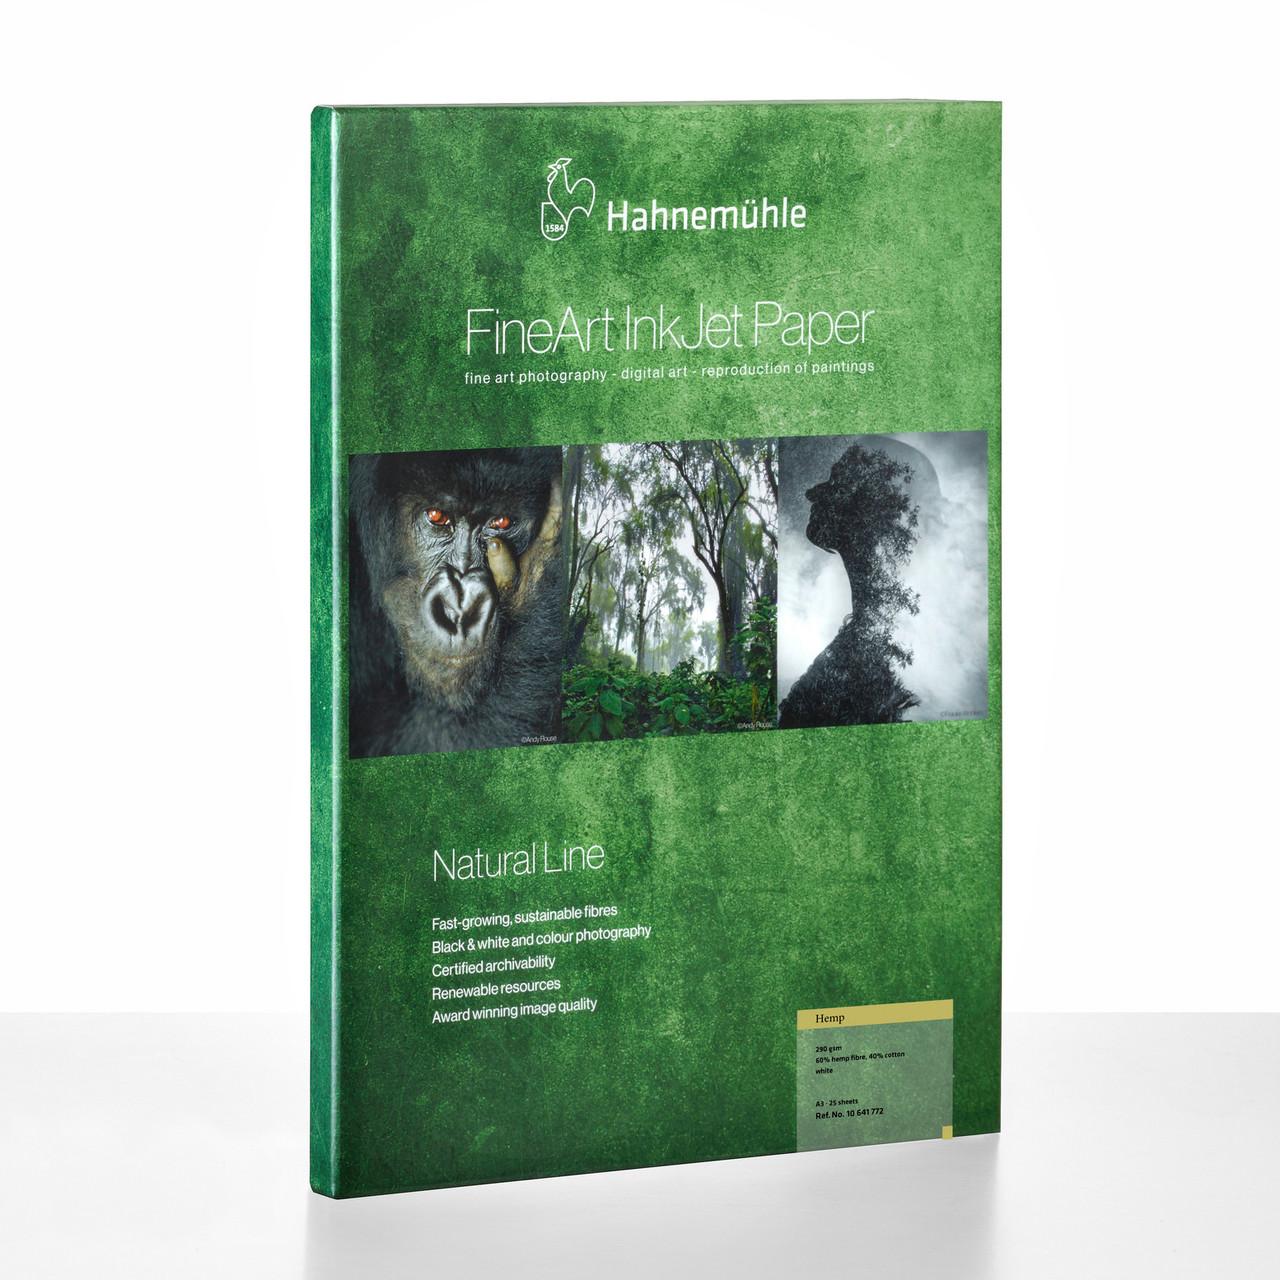 HAHNEMUHLE NATURAL LINE PAPER - HEMP (25 SHEETS)